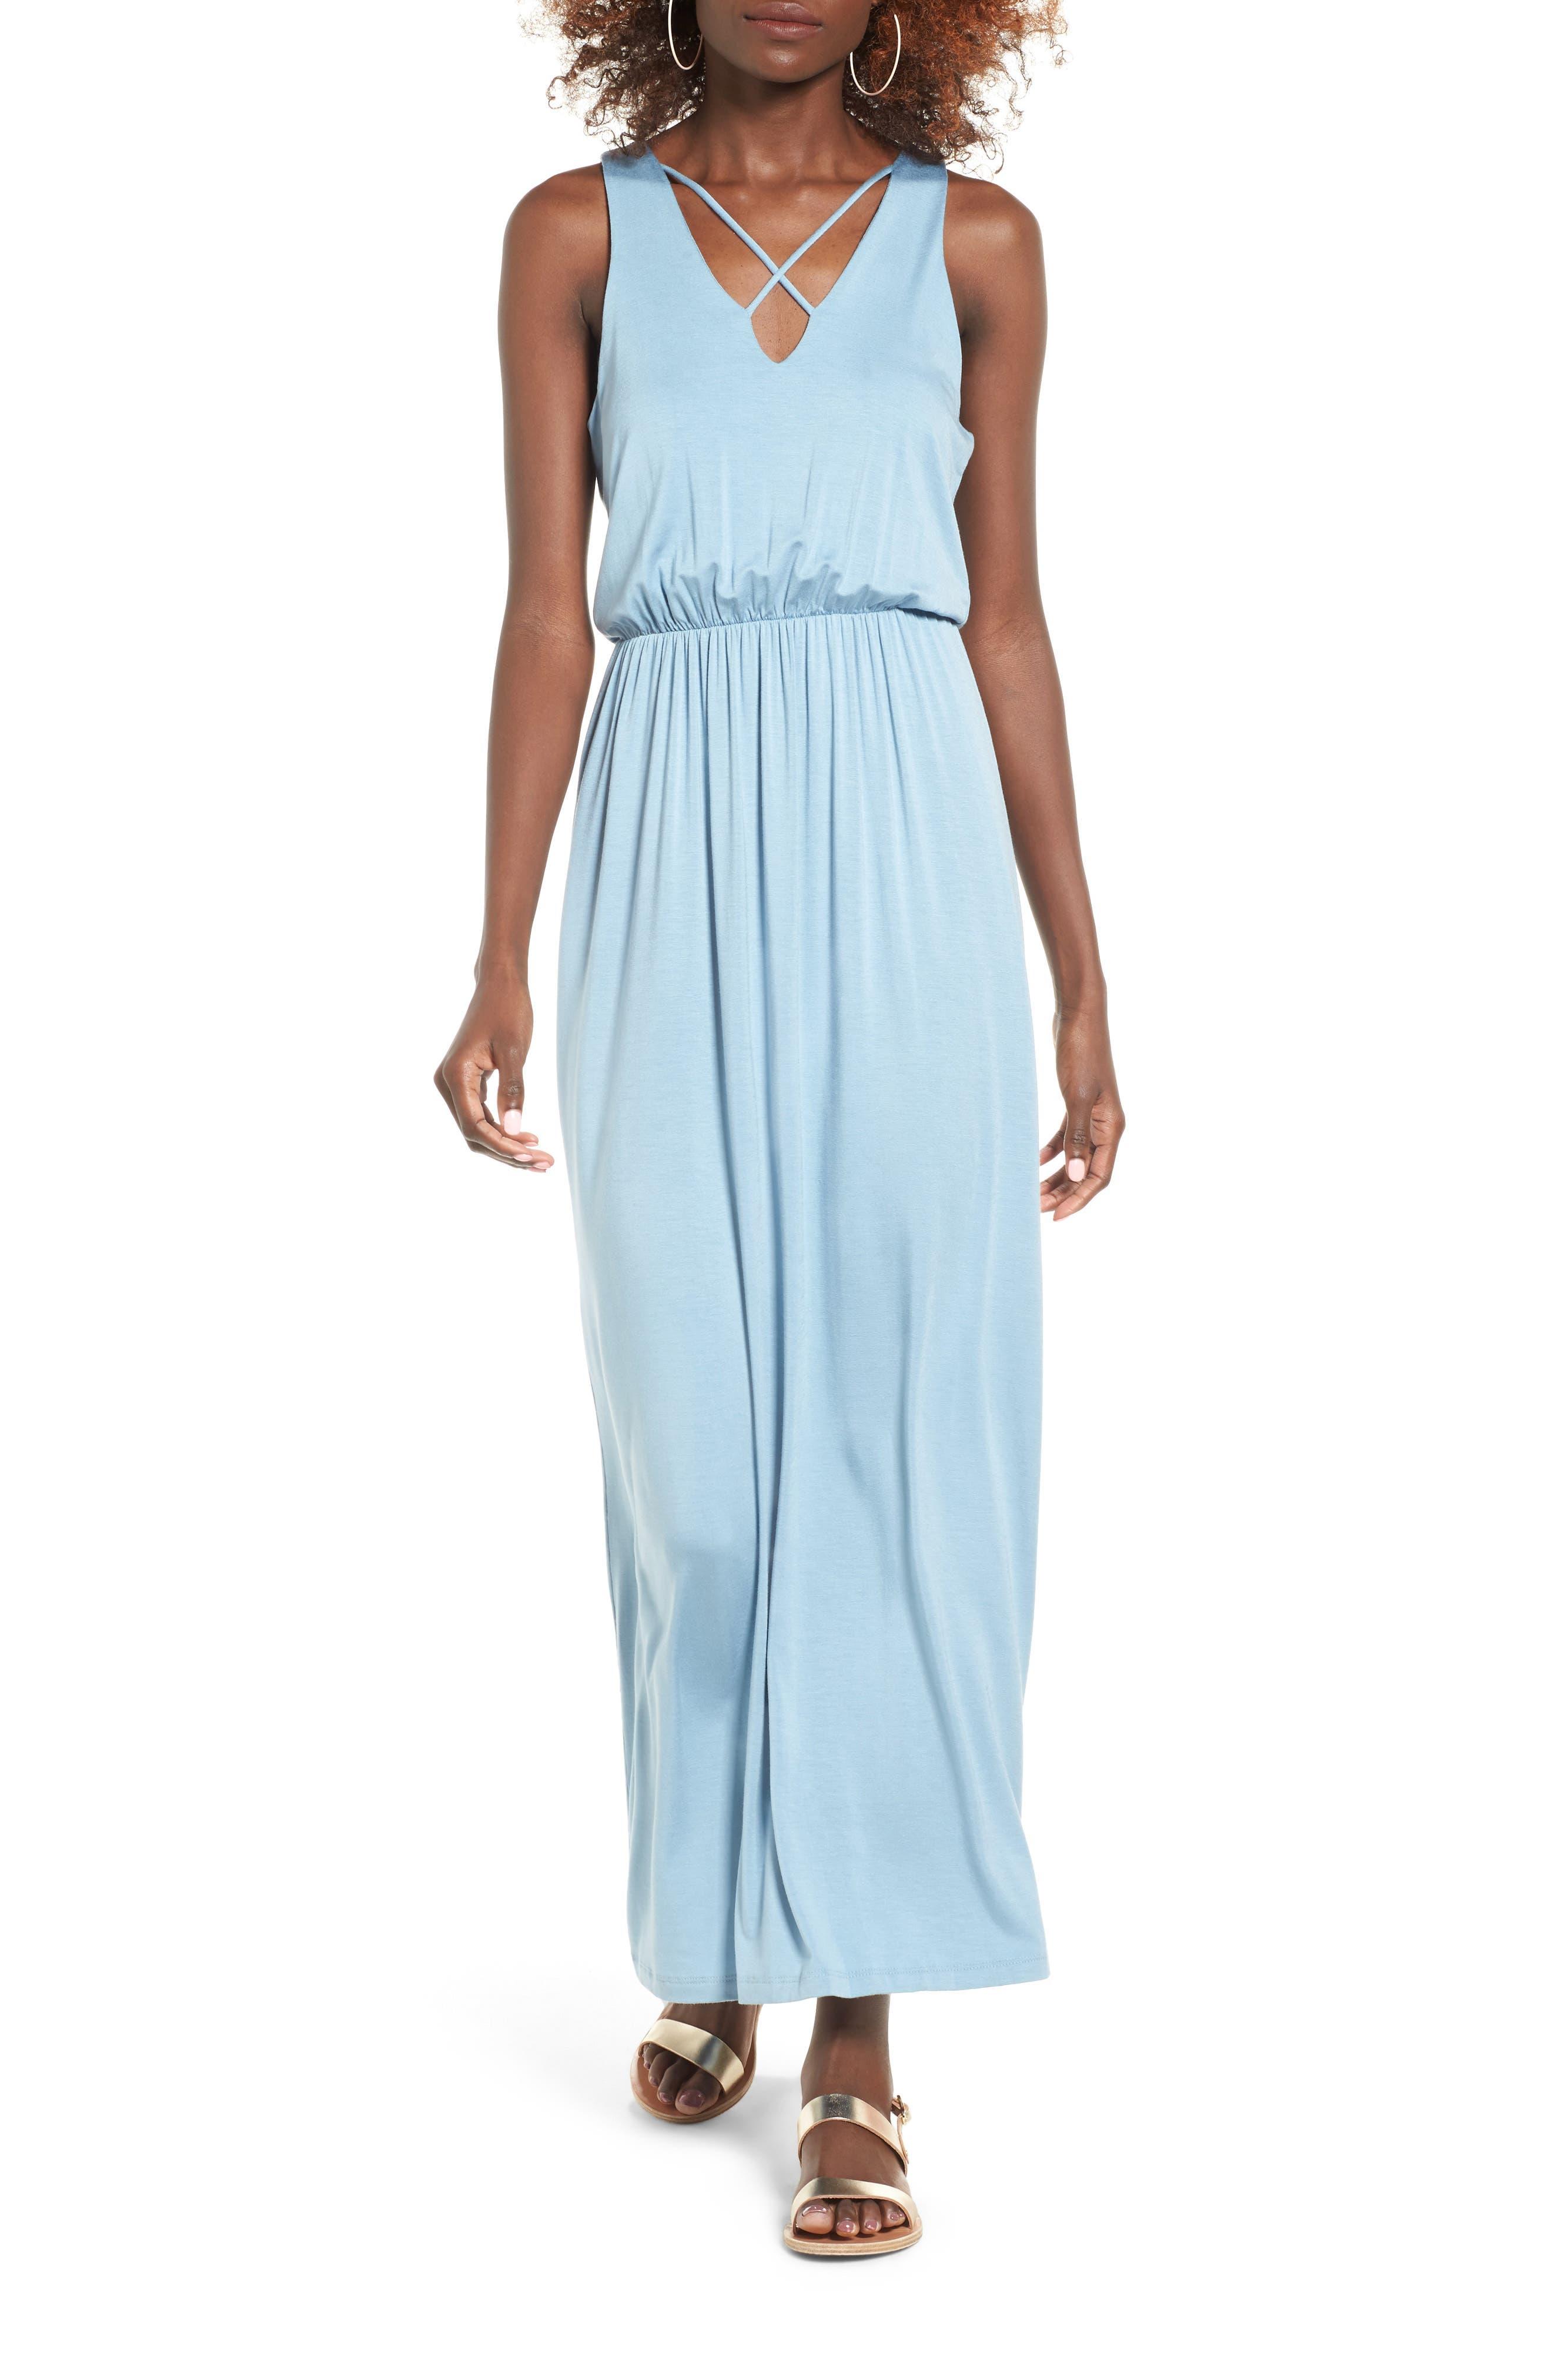 Alternate Image 1 Selected - Lush Cross Front Maxi Dress